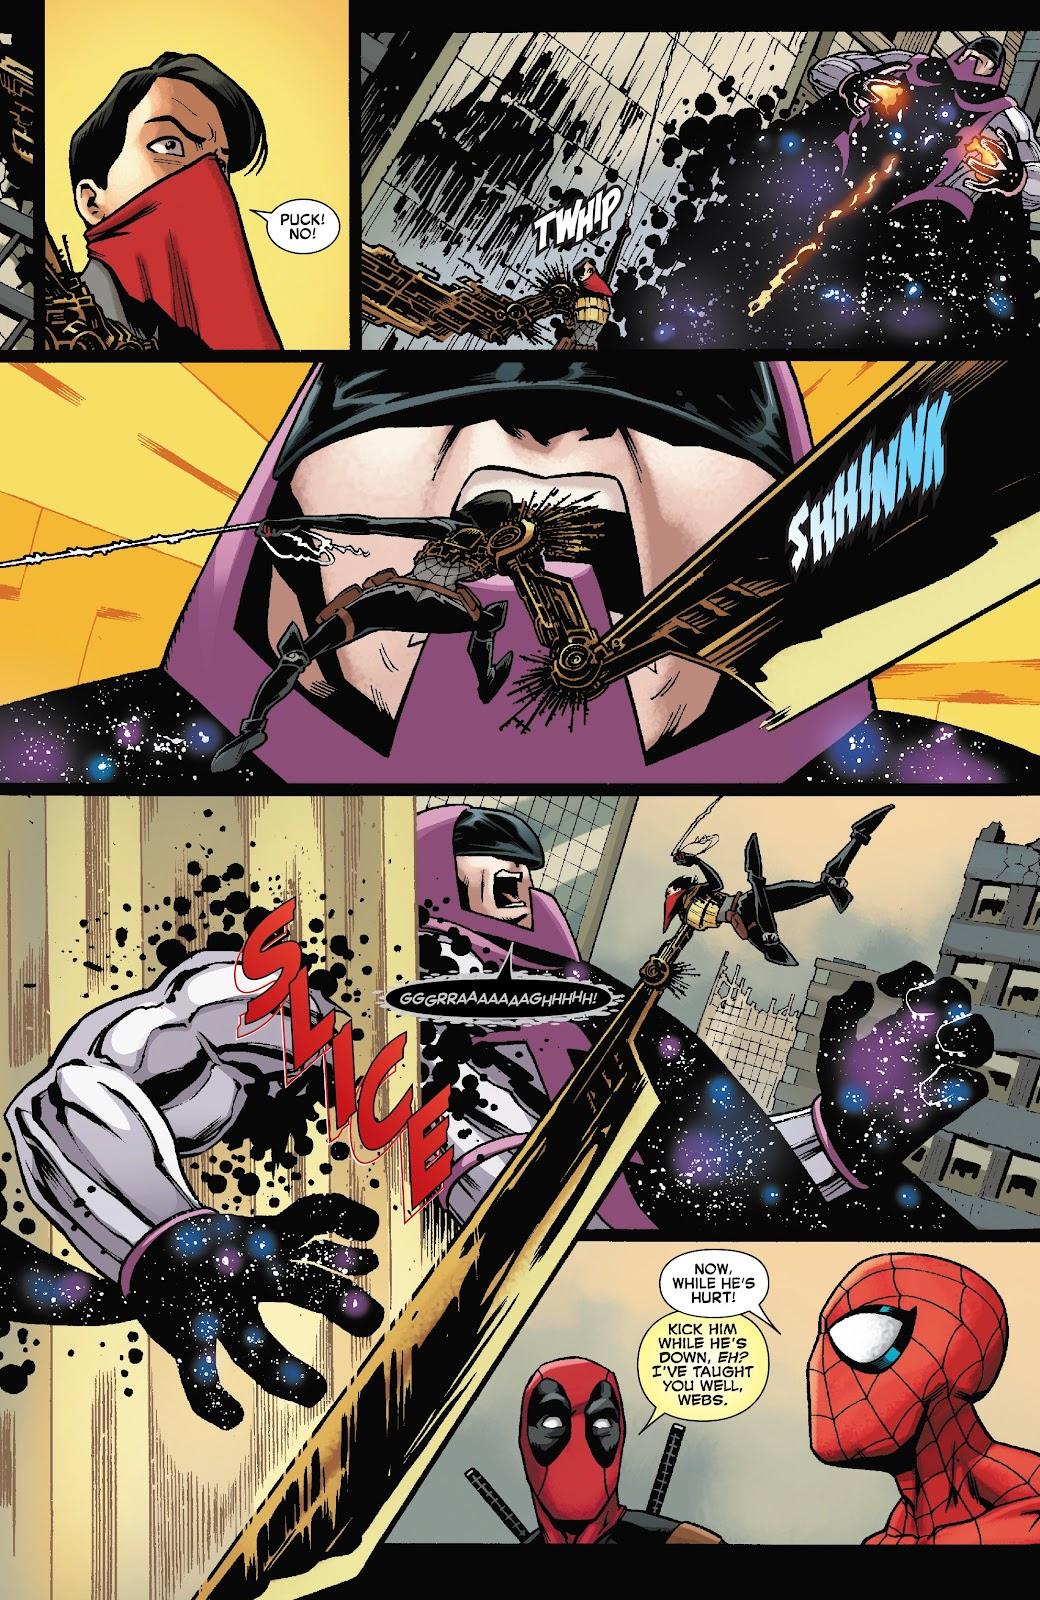 Read online Spider-Man/Deadpool comic -  Issue #47 - 18